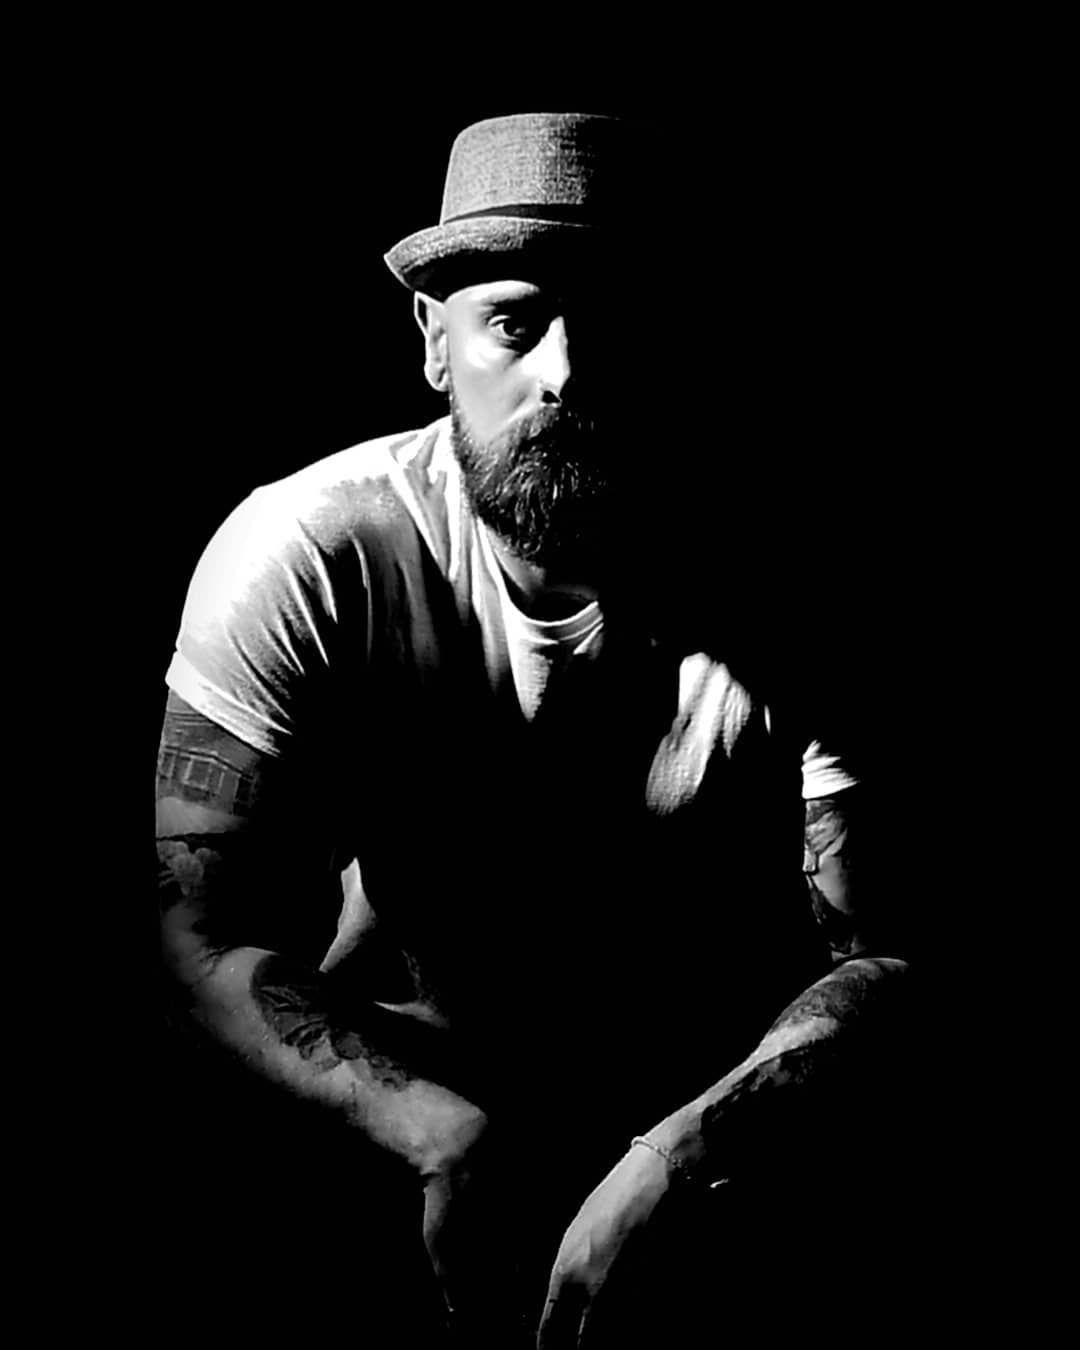 #creativephotography #peoplephotography #malemodel #malemodelsofinstagram #tattoos #tattooedmen #tattoosofinstagram #tattooedbodies #portraits #portraiture #maleportraits #portraitsofinstagram #creativeportraits #creativephoto #meanandmoody #blackandwhitephotography #blackandwhiteportraits #monochromephotography #blackandwhite #blackandwhiteoftheday #dailyportrait